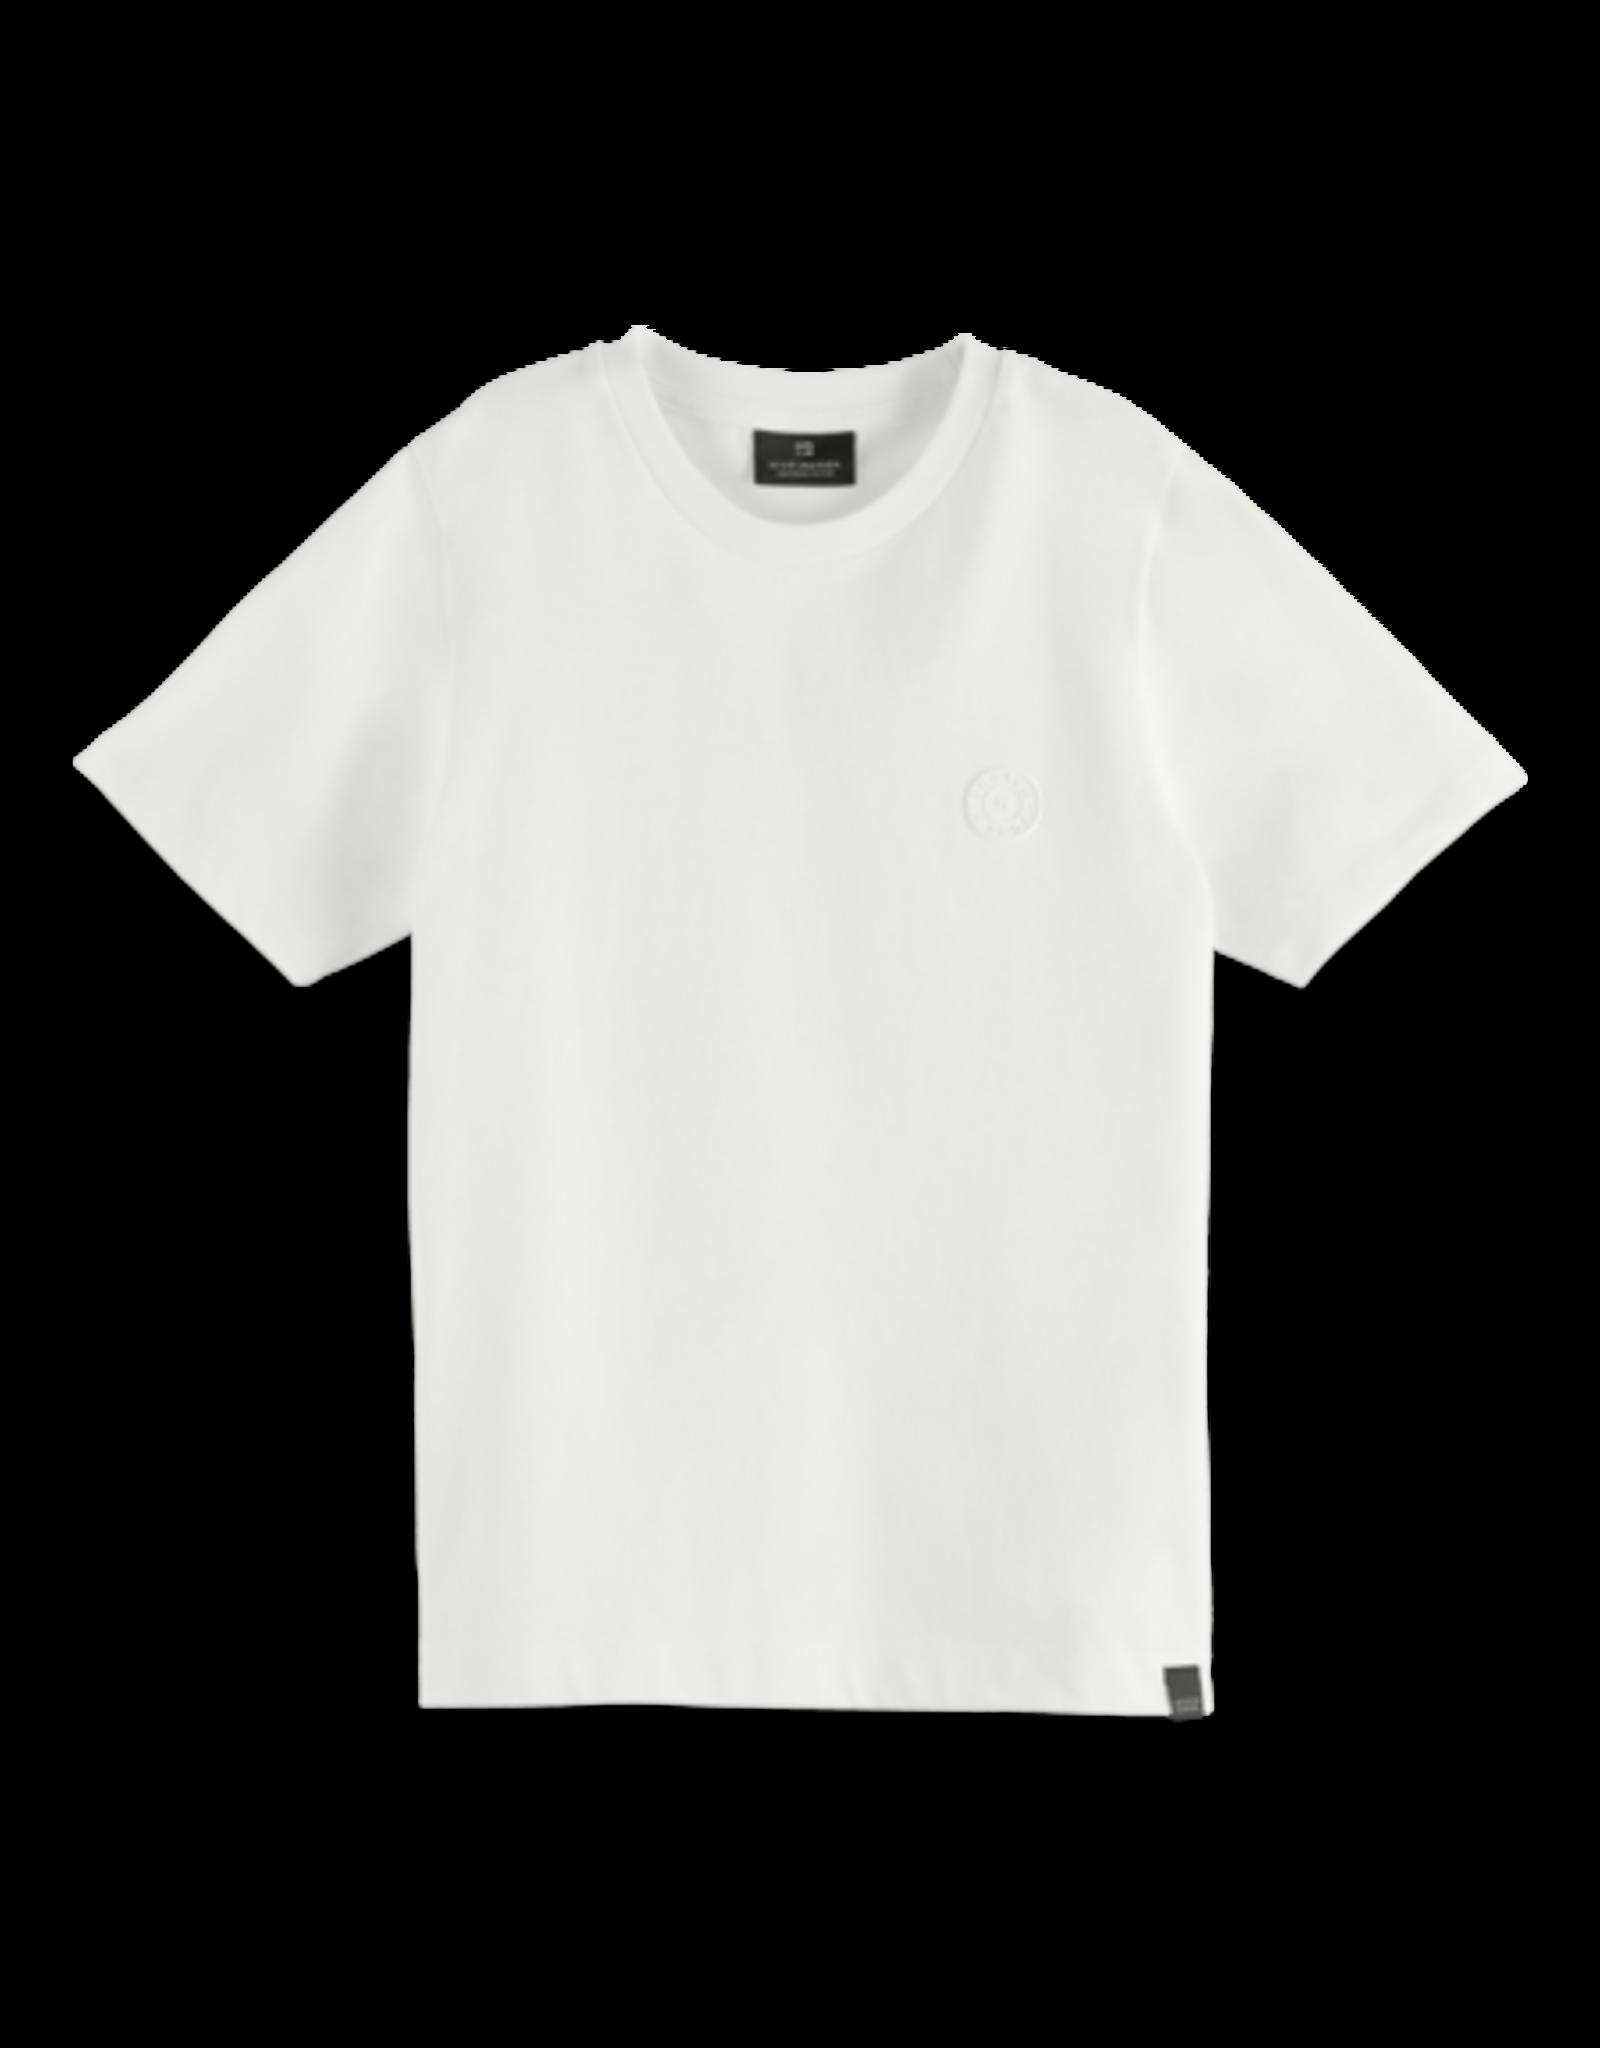 SCOTCH & SODA SCOTCH & SODA T-shirt 160110